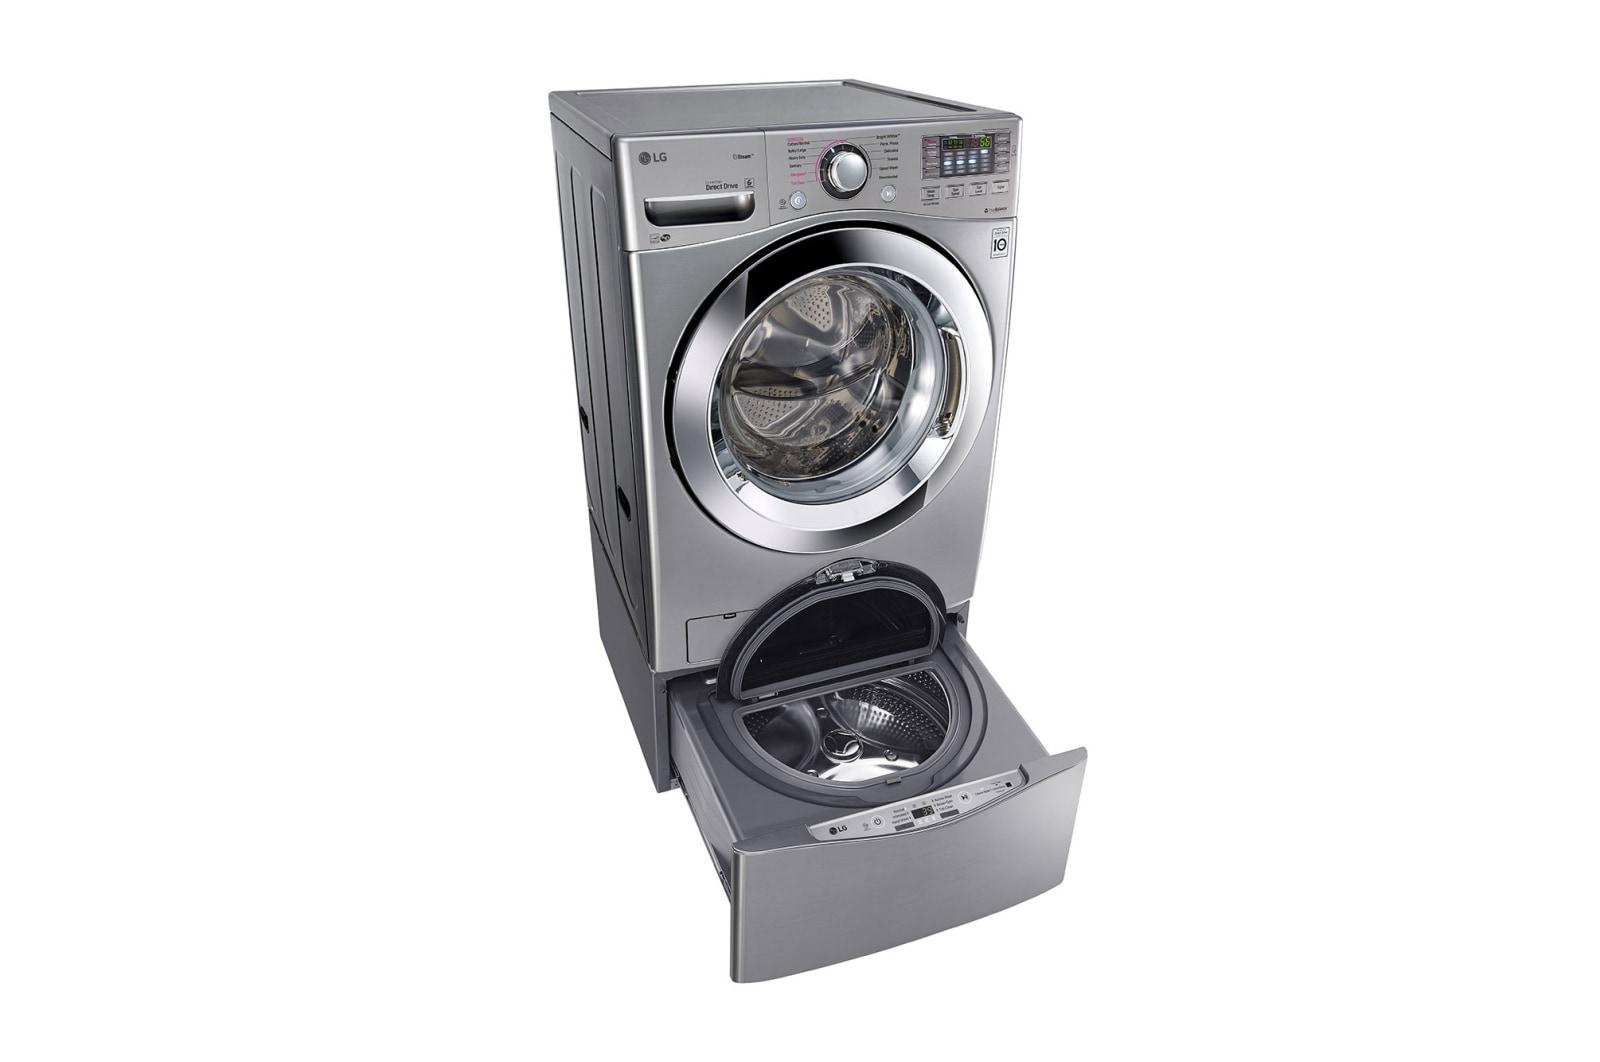 Lg Front Load Washers Wm4270hva 5 2 Cu Ft Ultra Large Capacity Turbowash Washer With Nfc Tag On Canada